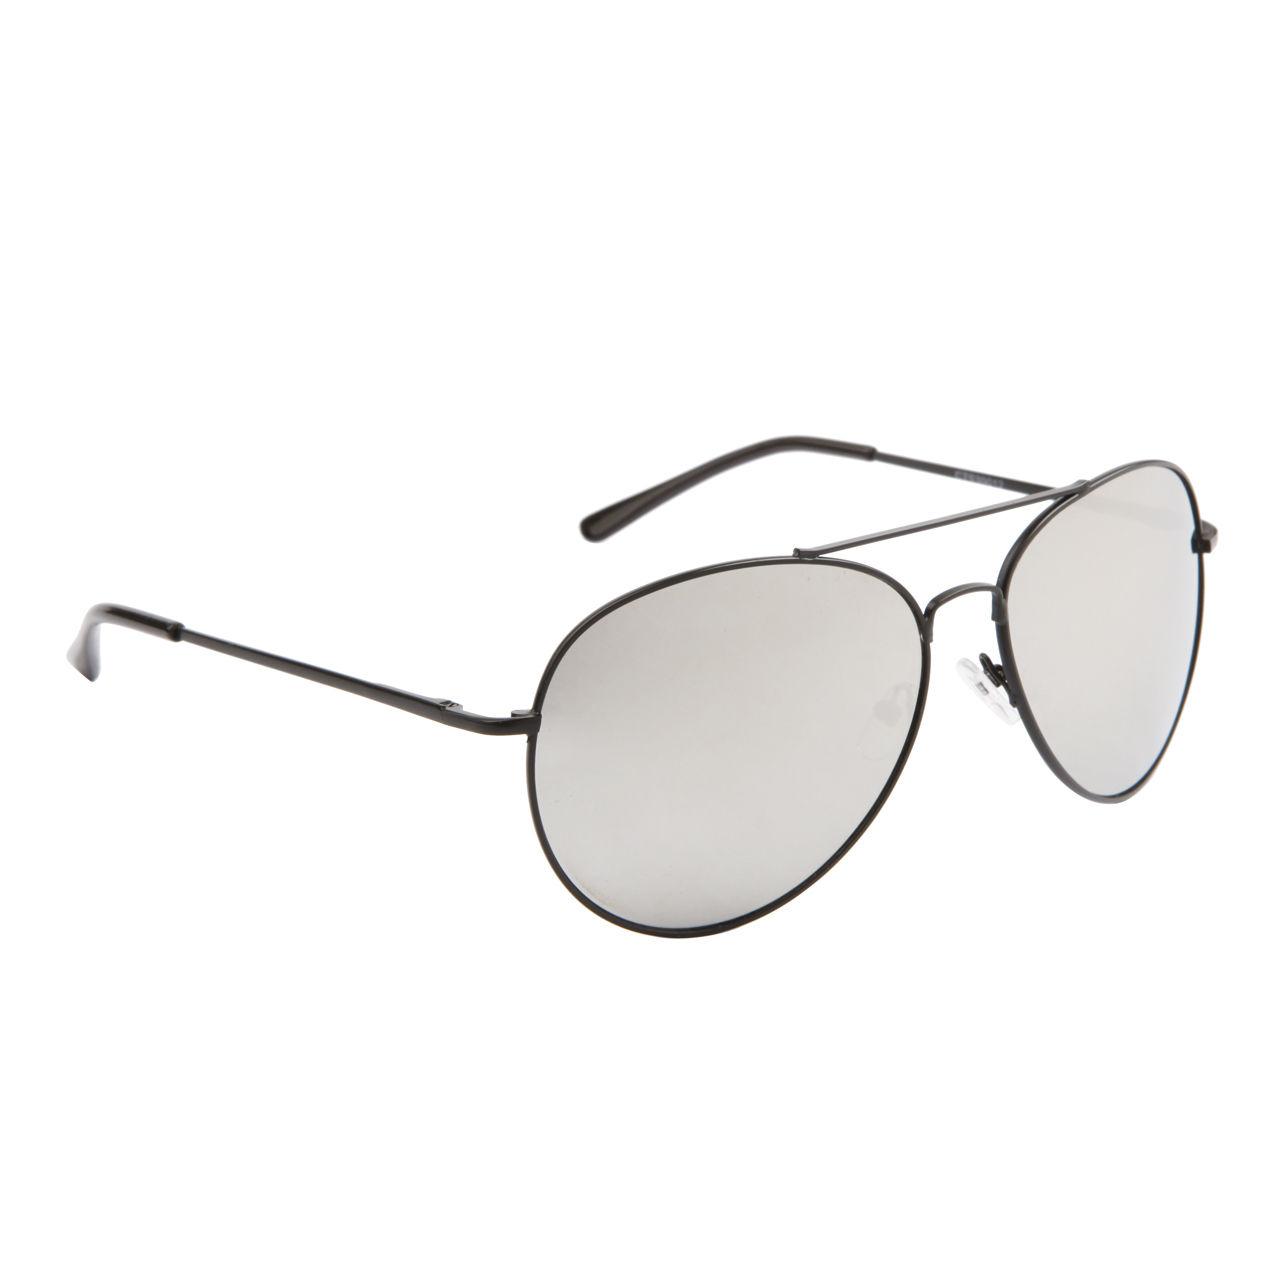 1280x1280 Mirrored Aviator Sunglasses Adult Opaque Top Gun High Quality